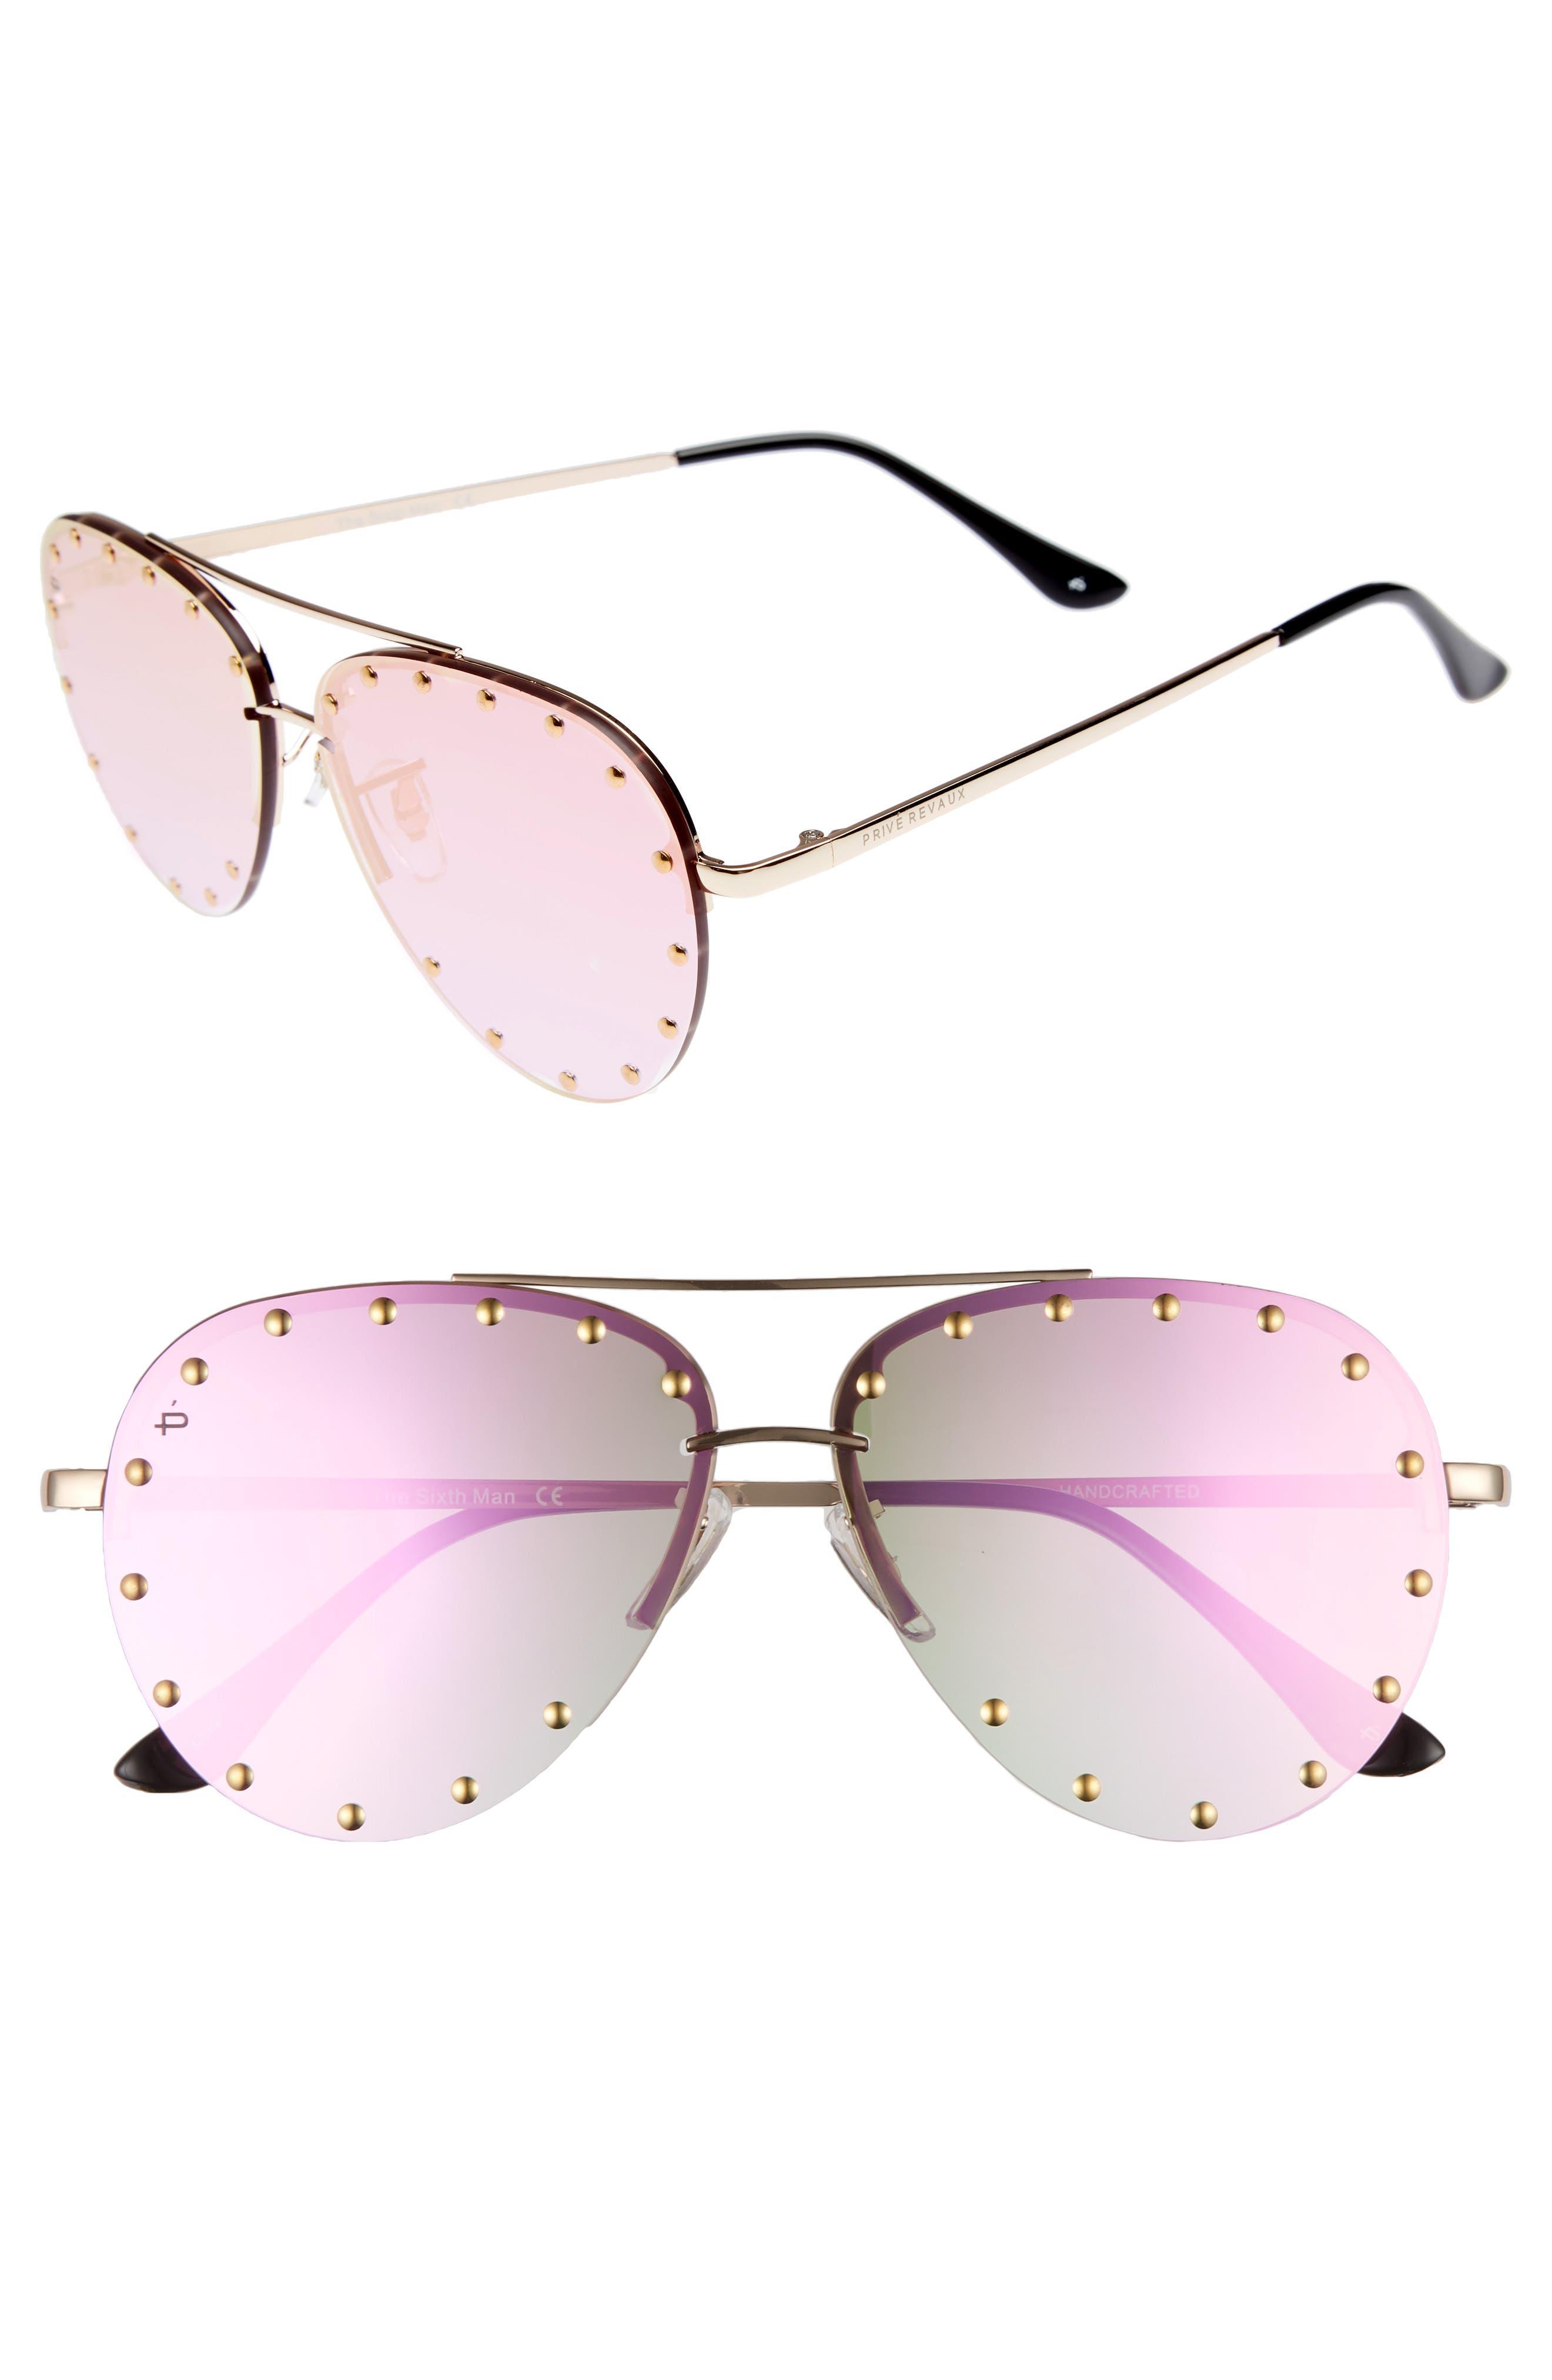 Privé Revaux The Sixth Man 60mm Studded Aviator Sunglasses,                             Main thumbnail 3, color,